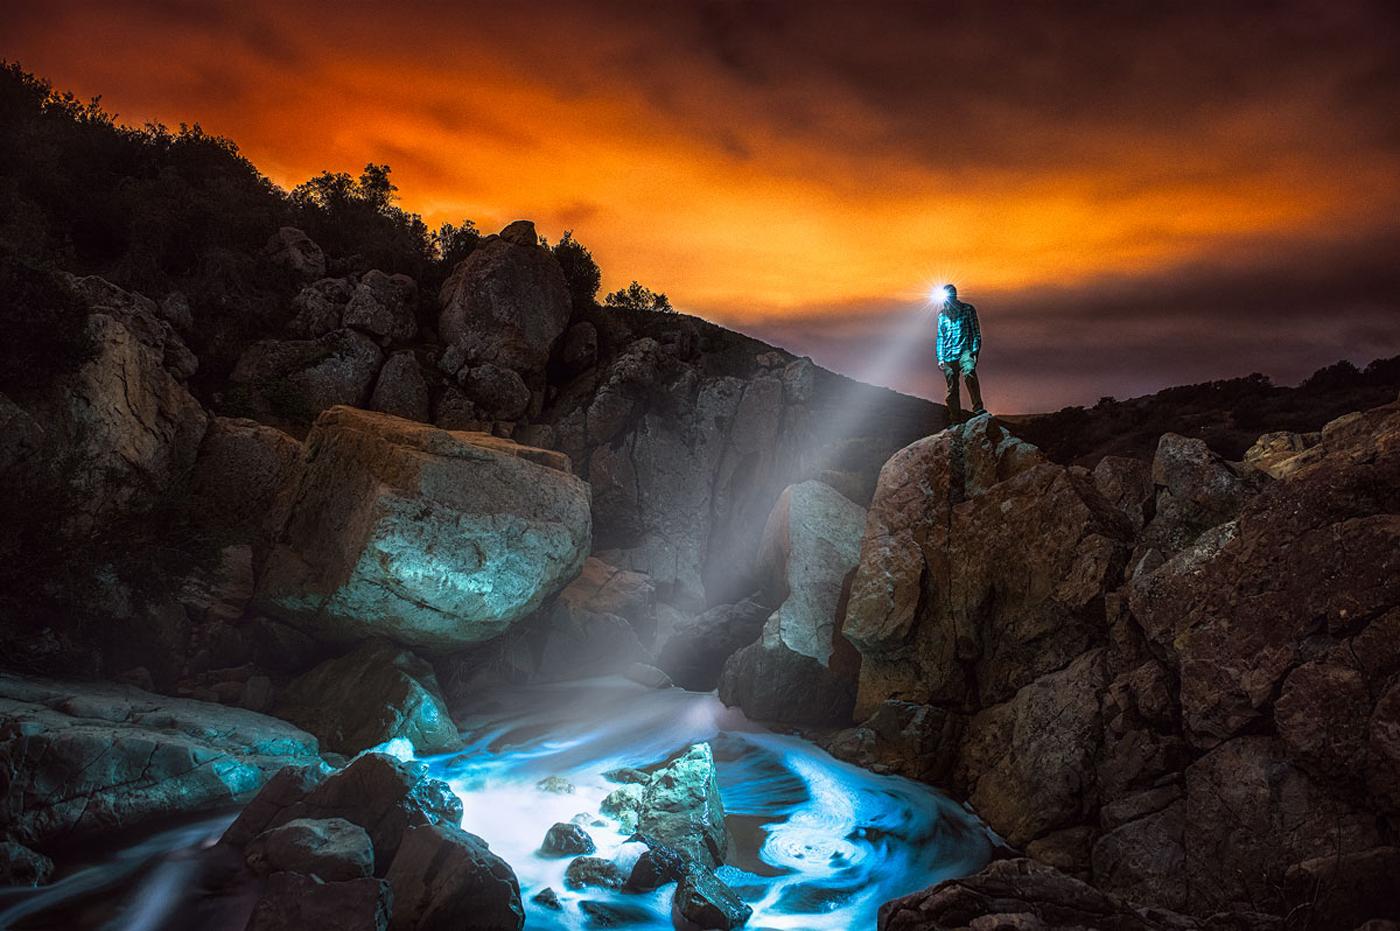 austin-trigg-southern-california-california-night-waterfall-penasquitos-canyon-light-outdoor-camp-hike-adventure.jpg